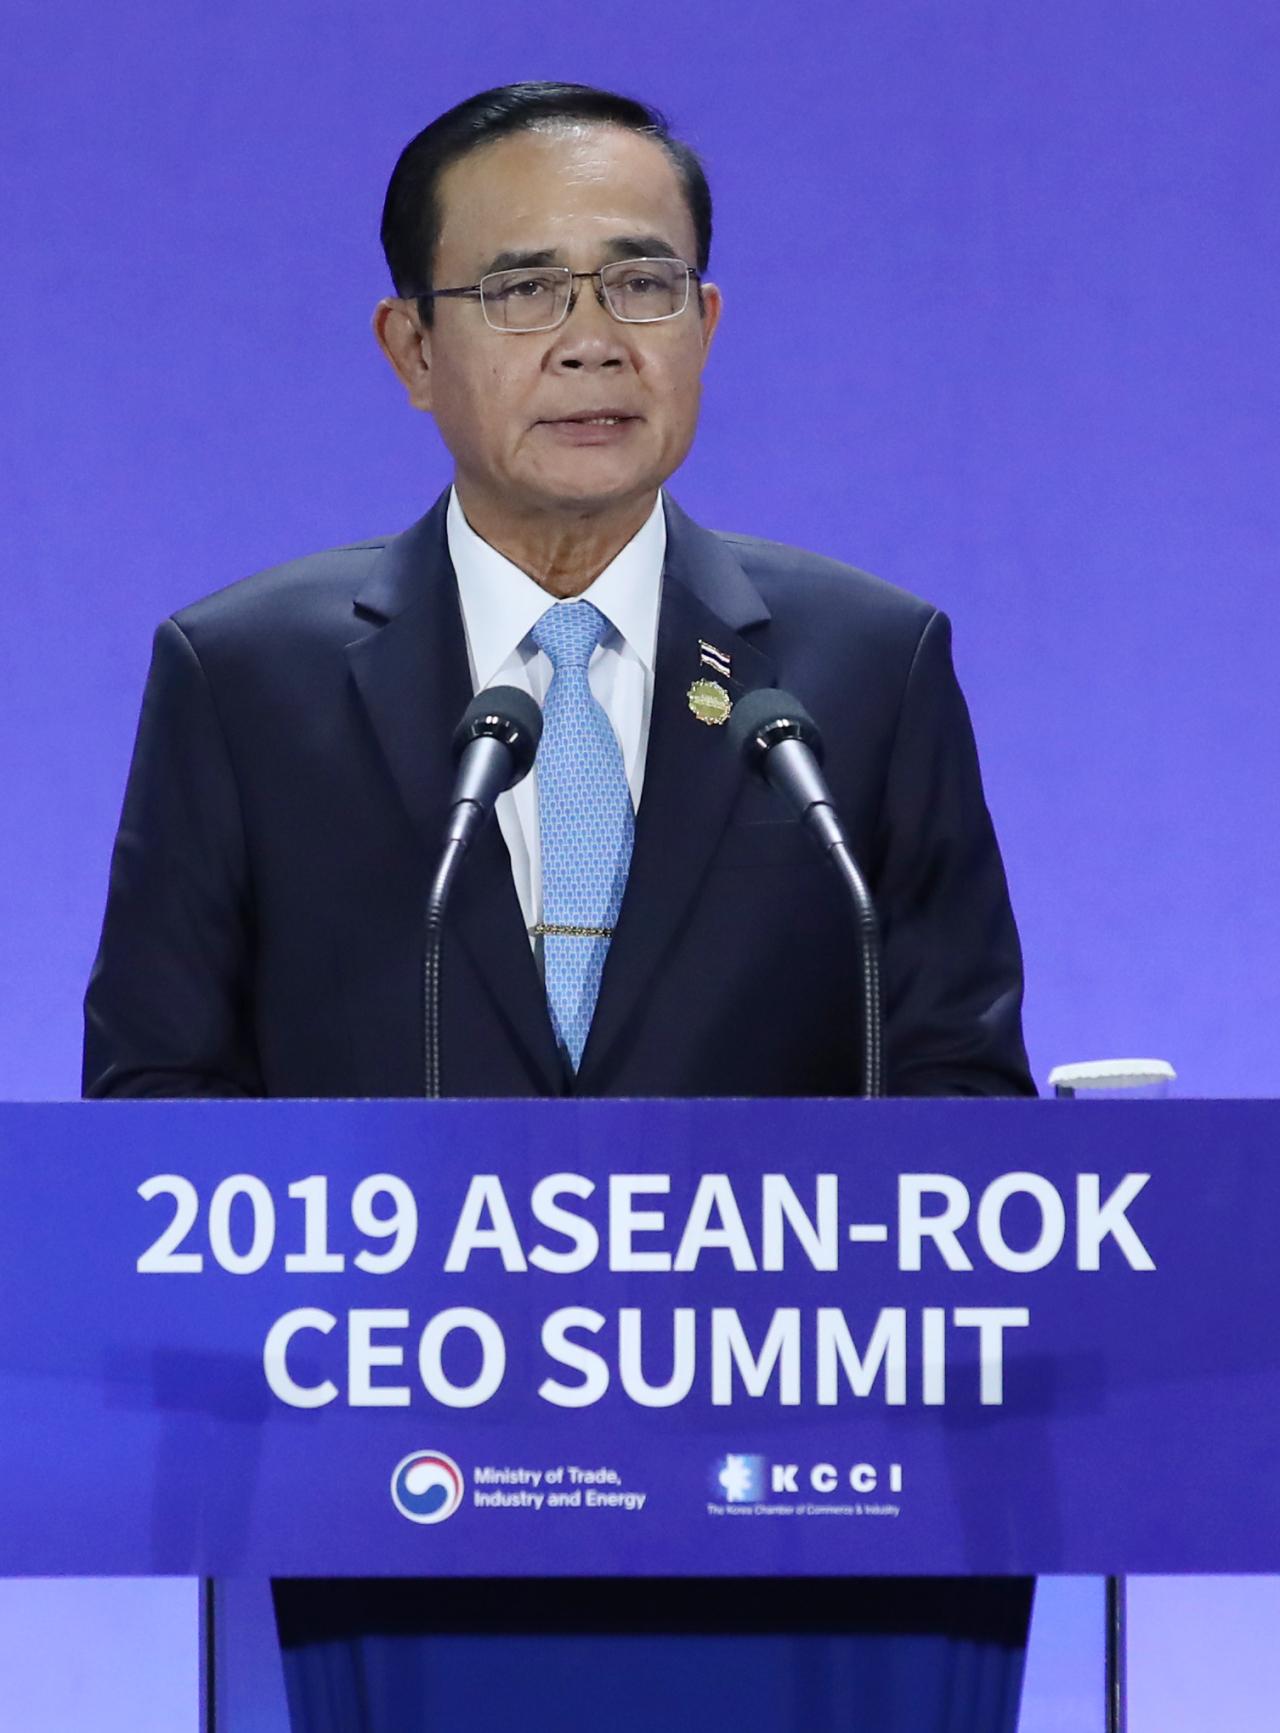 Thai Prime Minister Prayut Chan-o-cha (Yonhap)